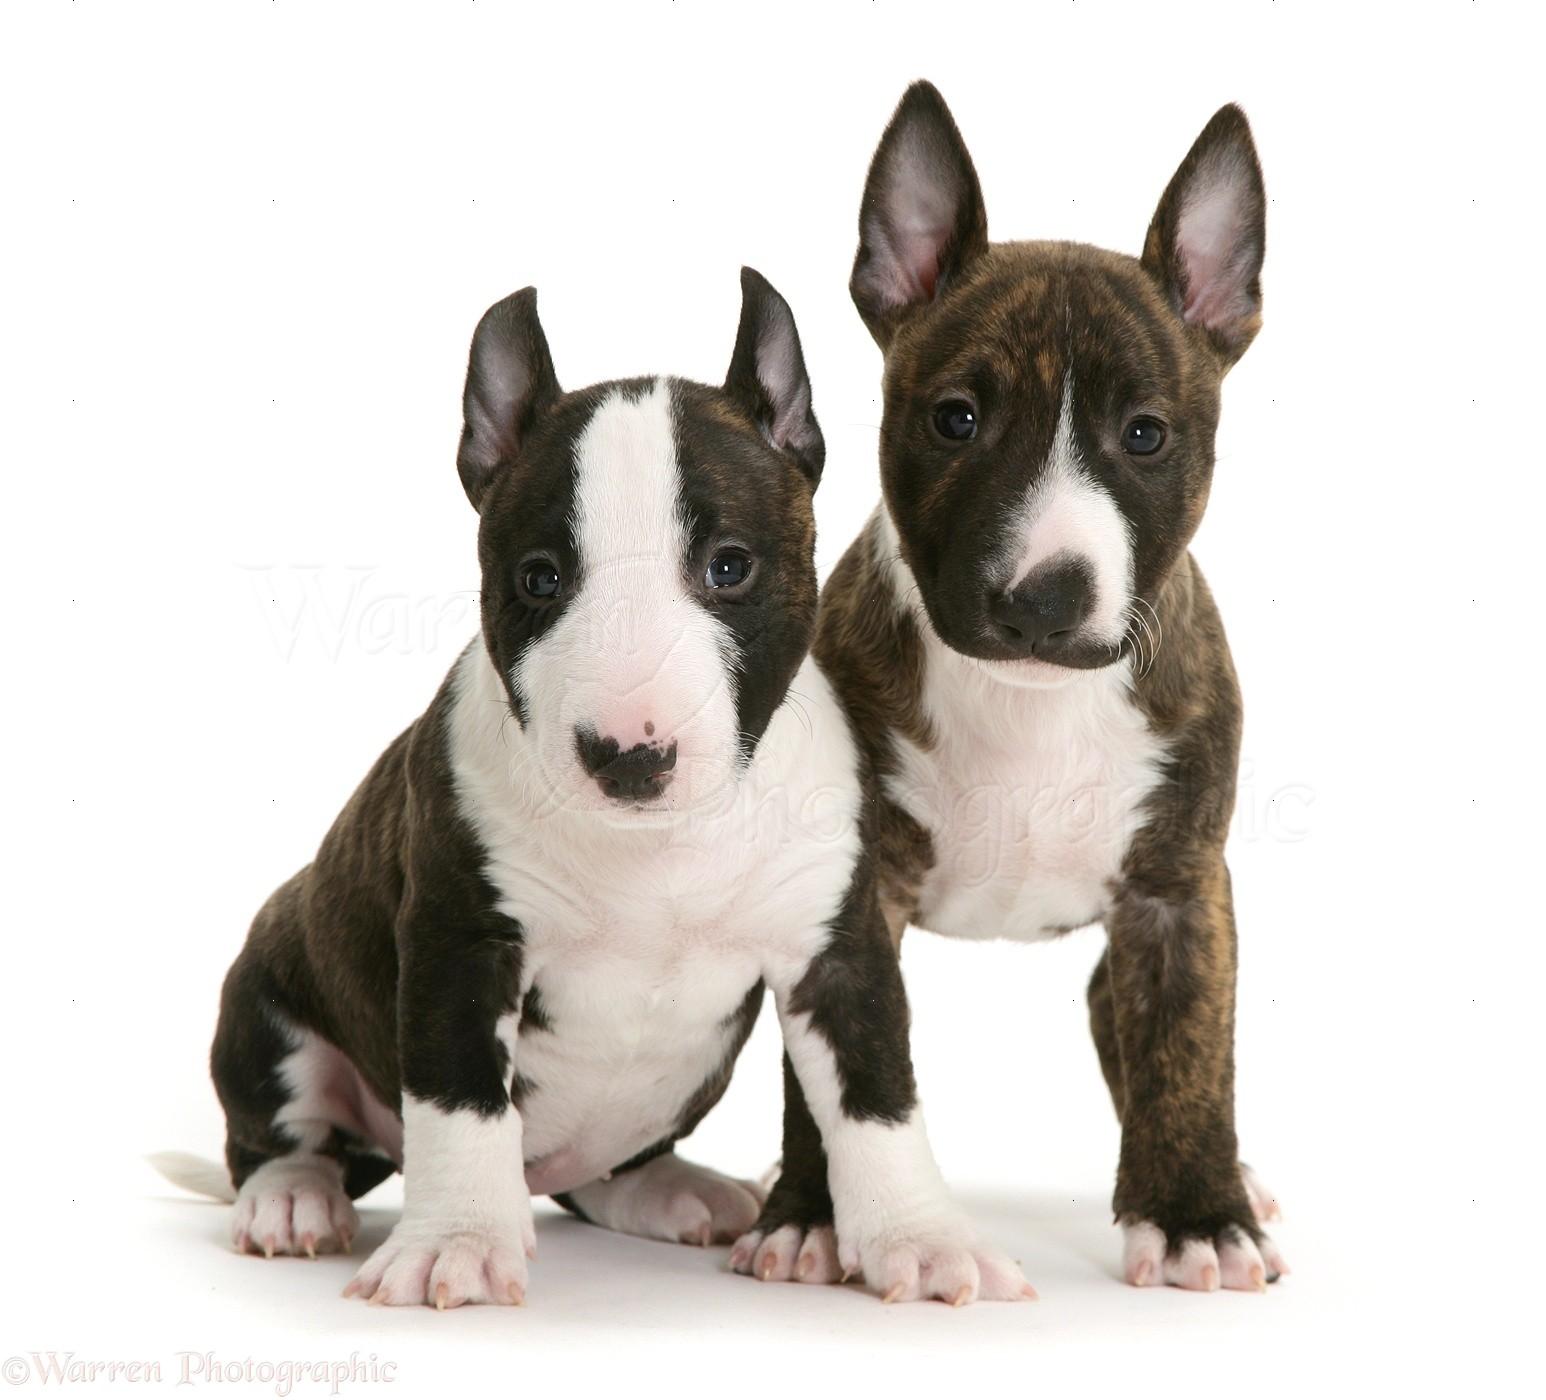 Bekend Dogs: Miniature English Bull Terrier pups photo WP15200 JL77